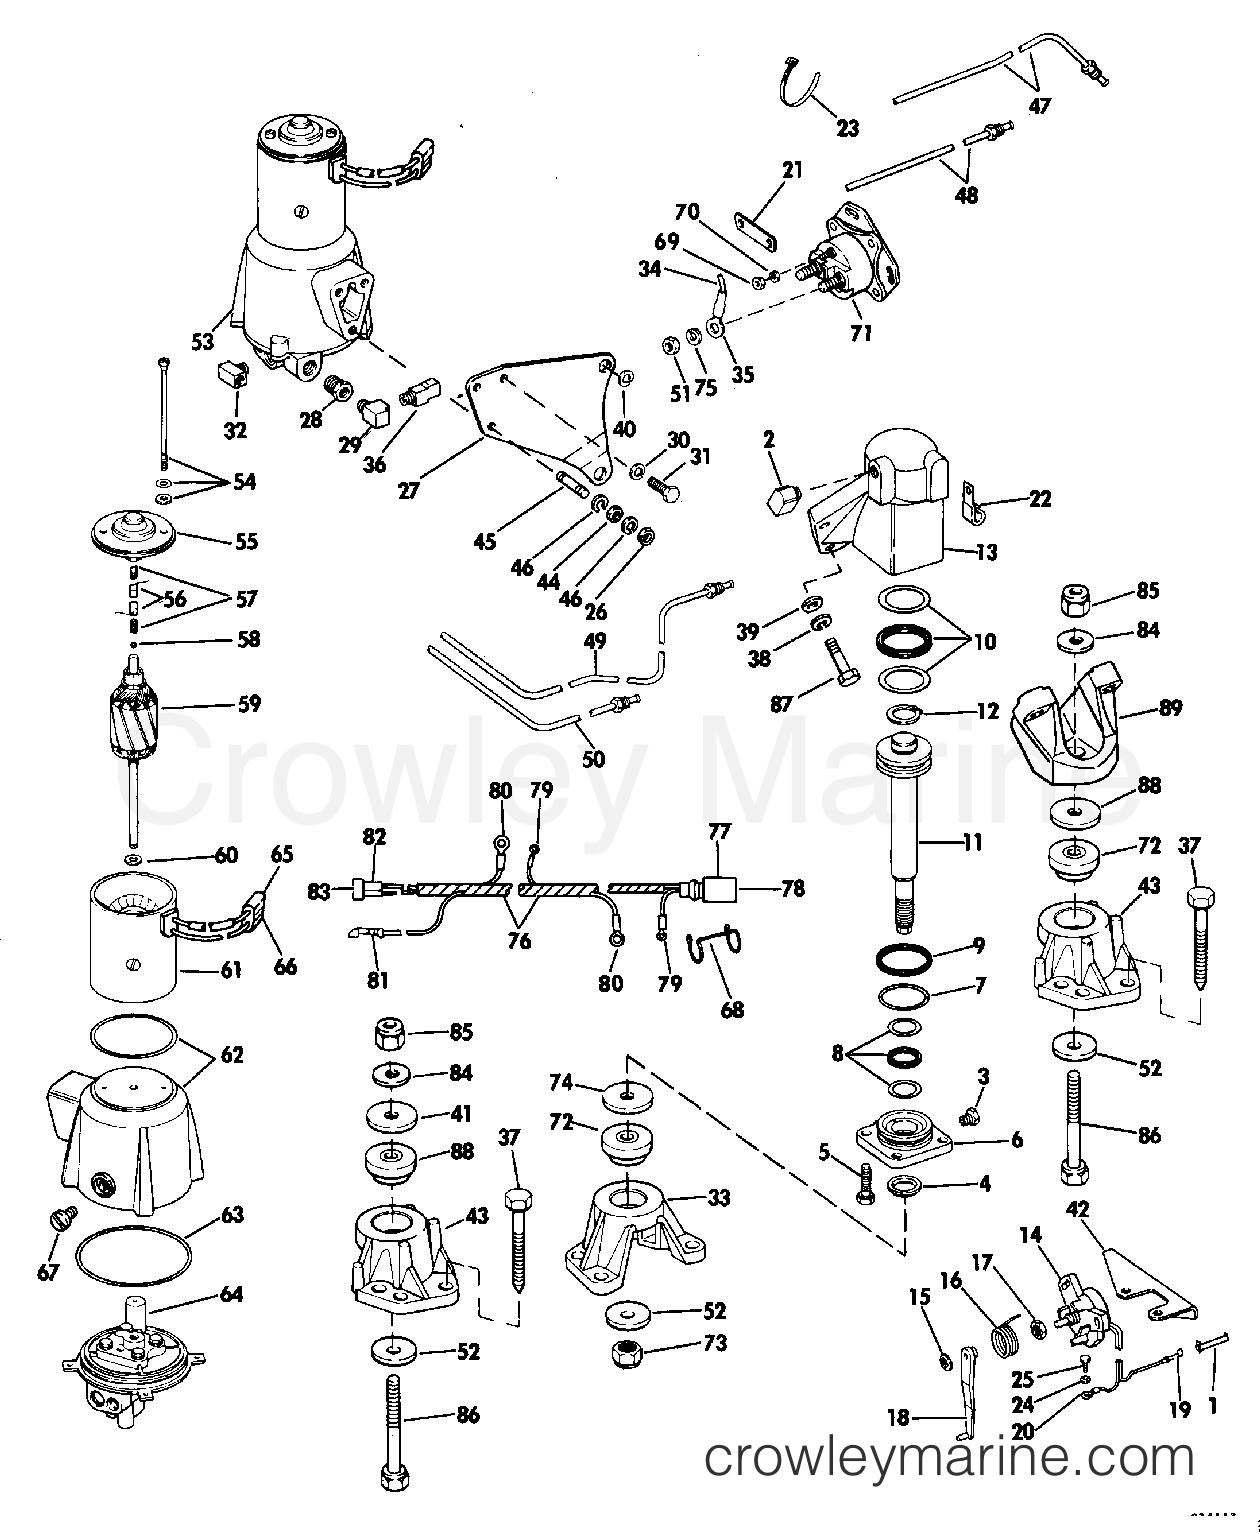 Engine Mount Group